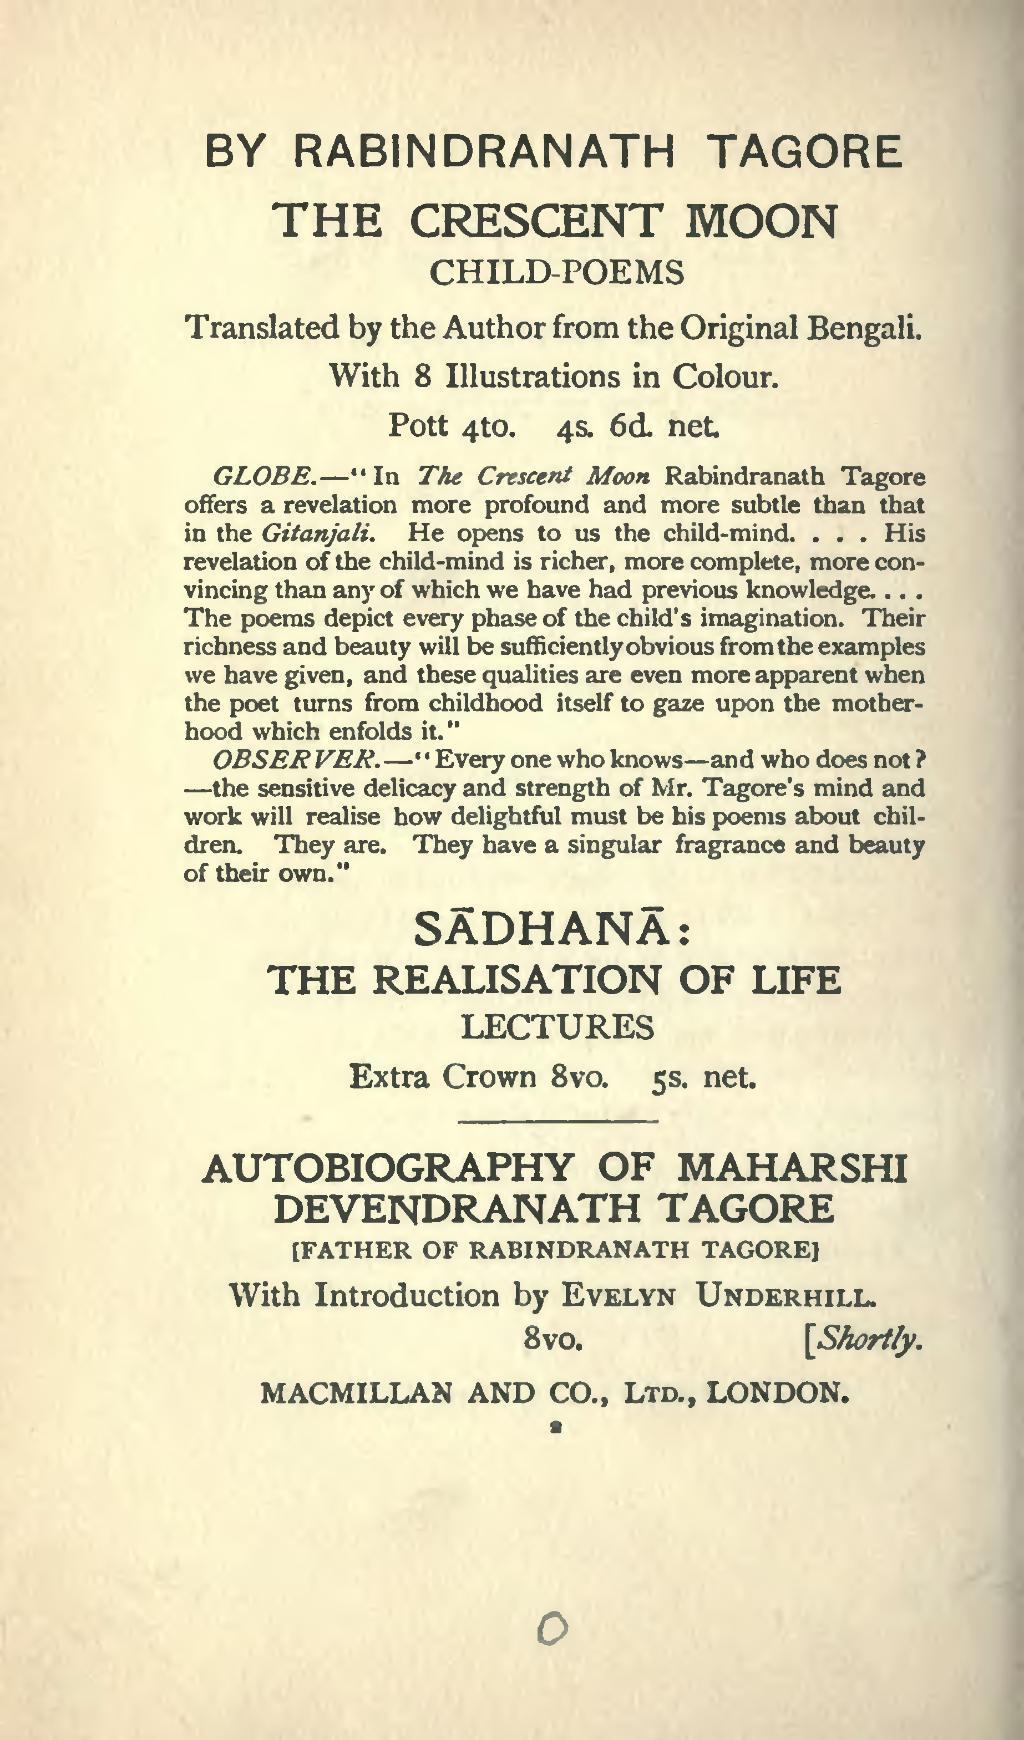 gitanjali by rabindranath tagore pdf free download